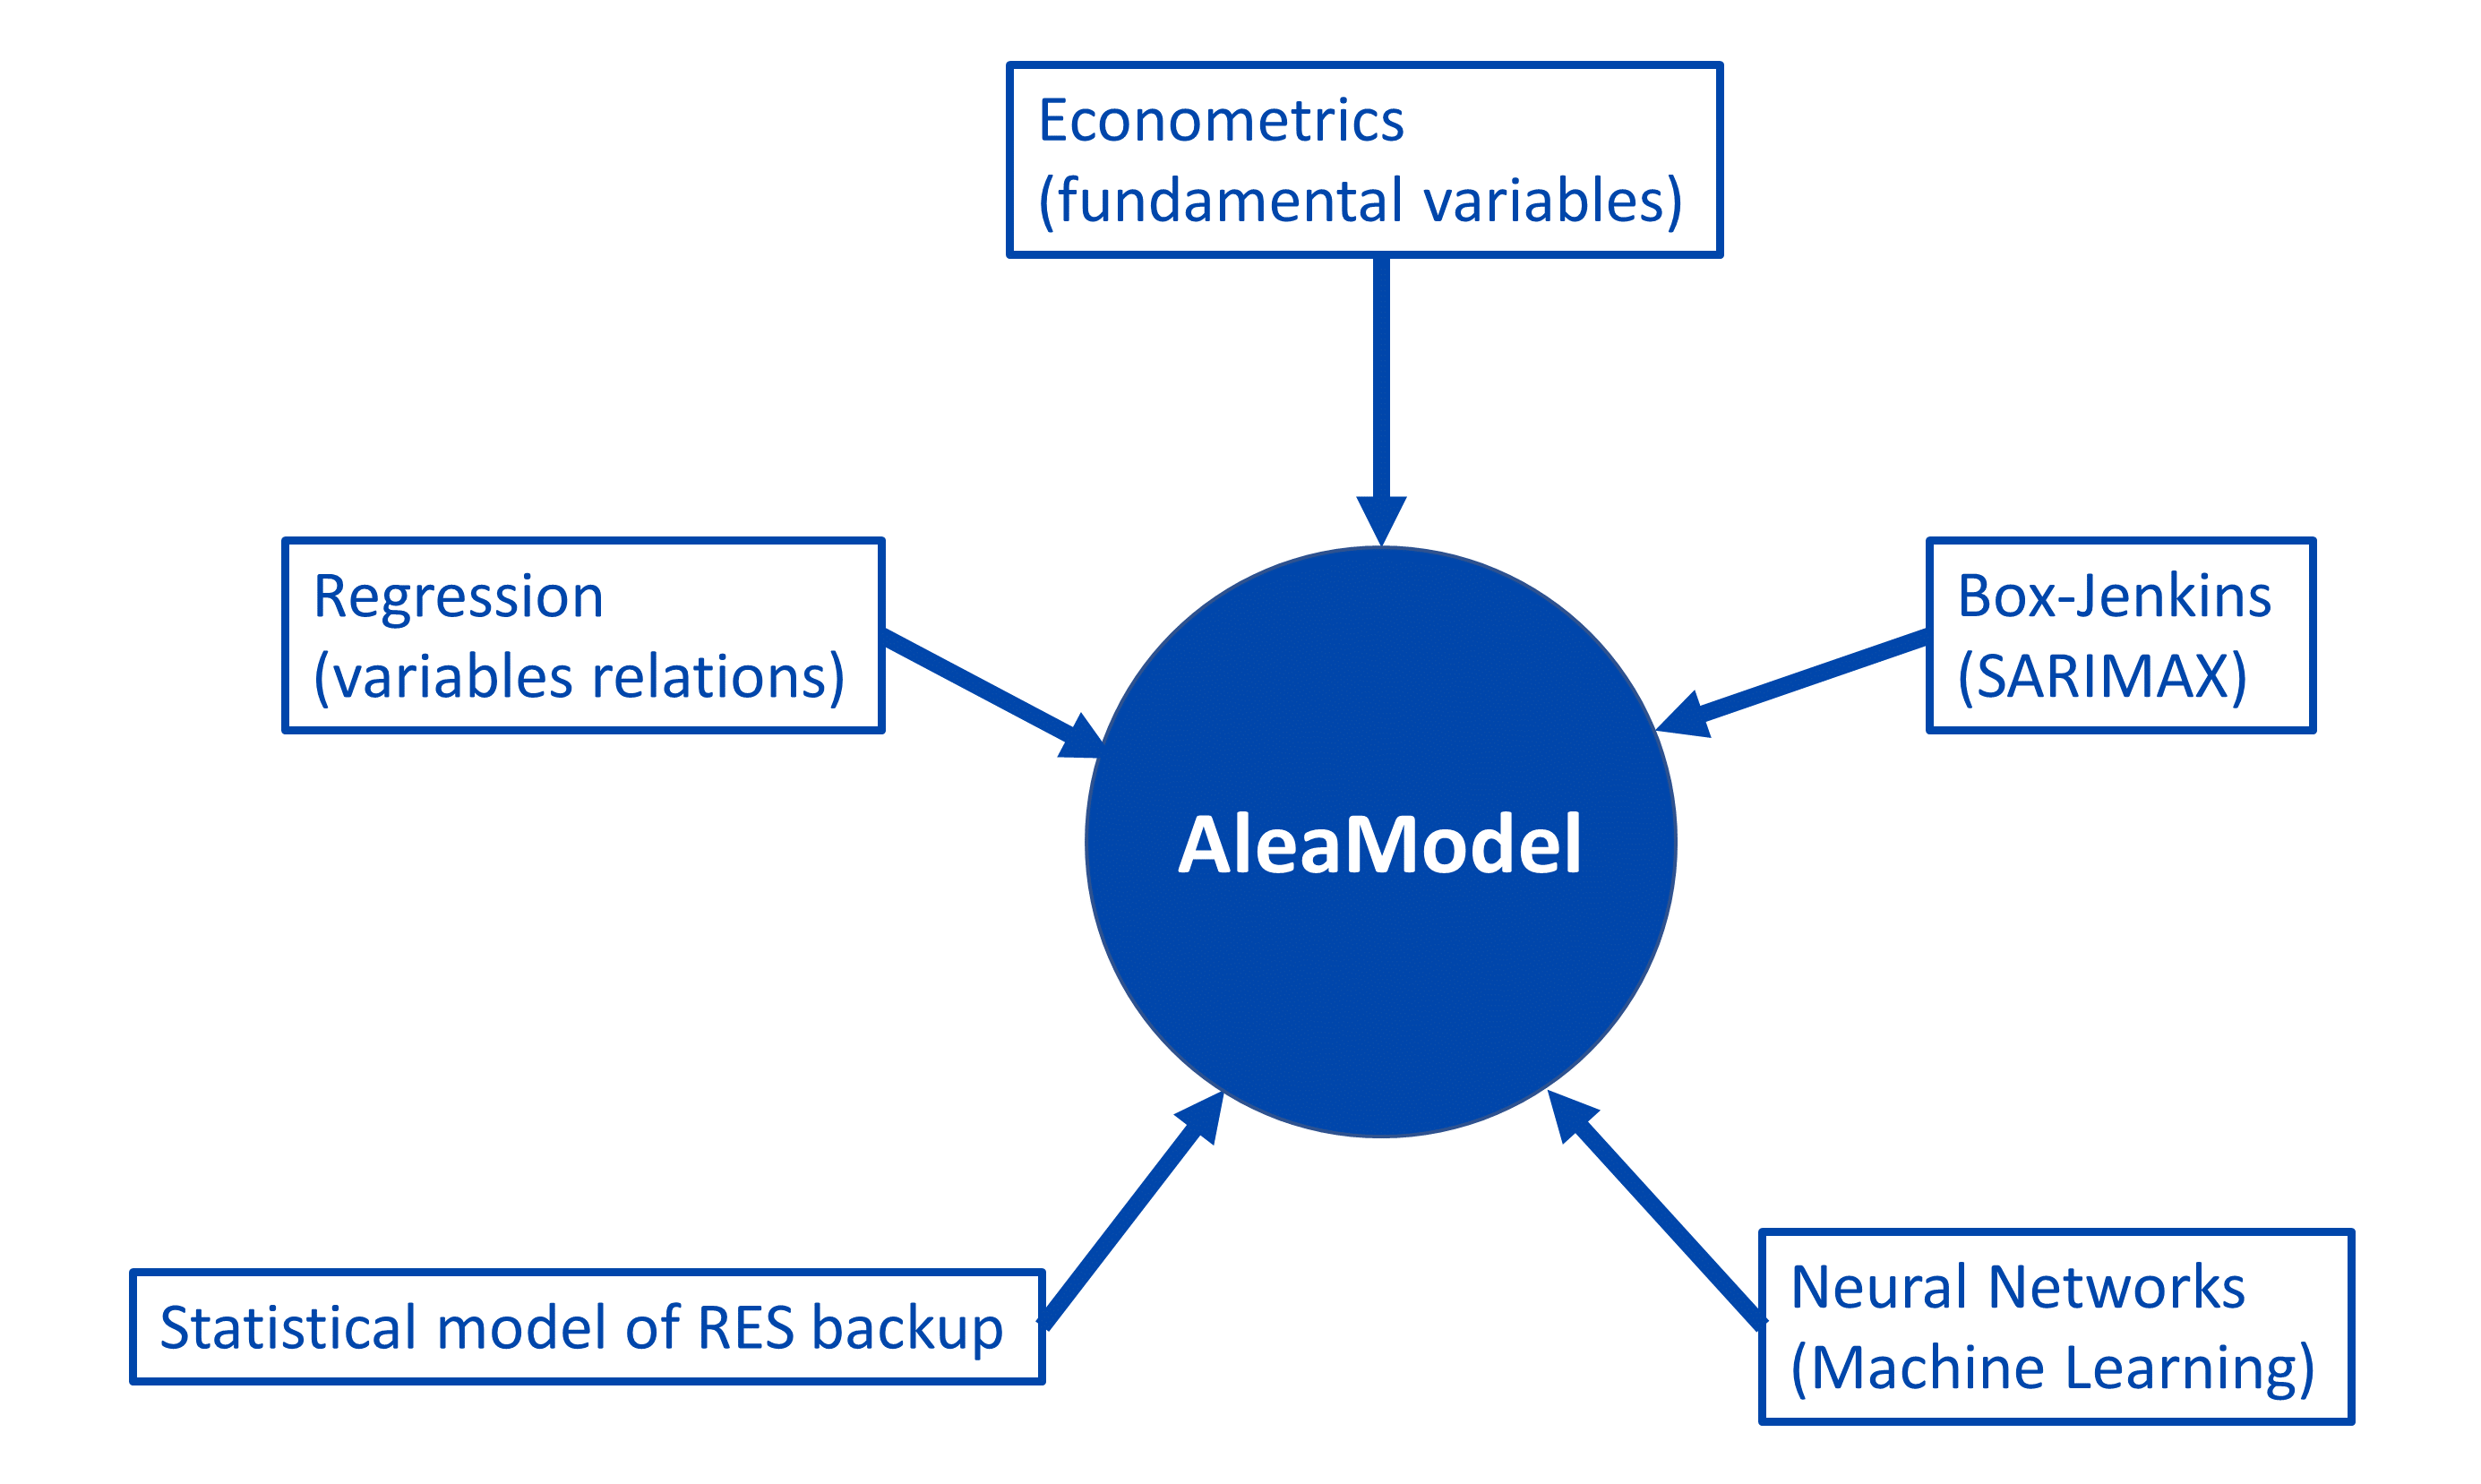 AleaSoft - Models and variables AleaModel